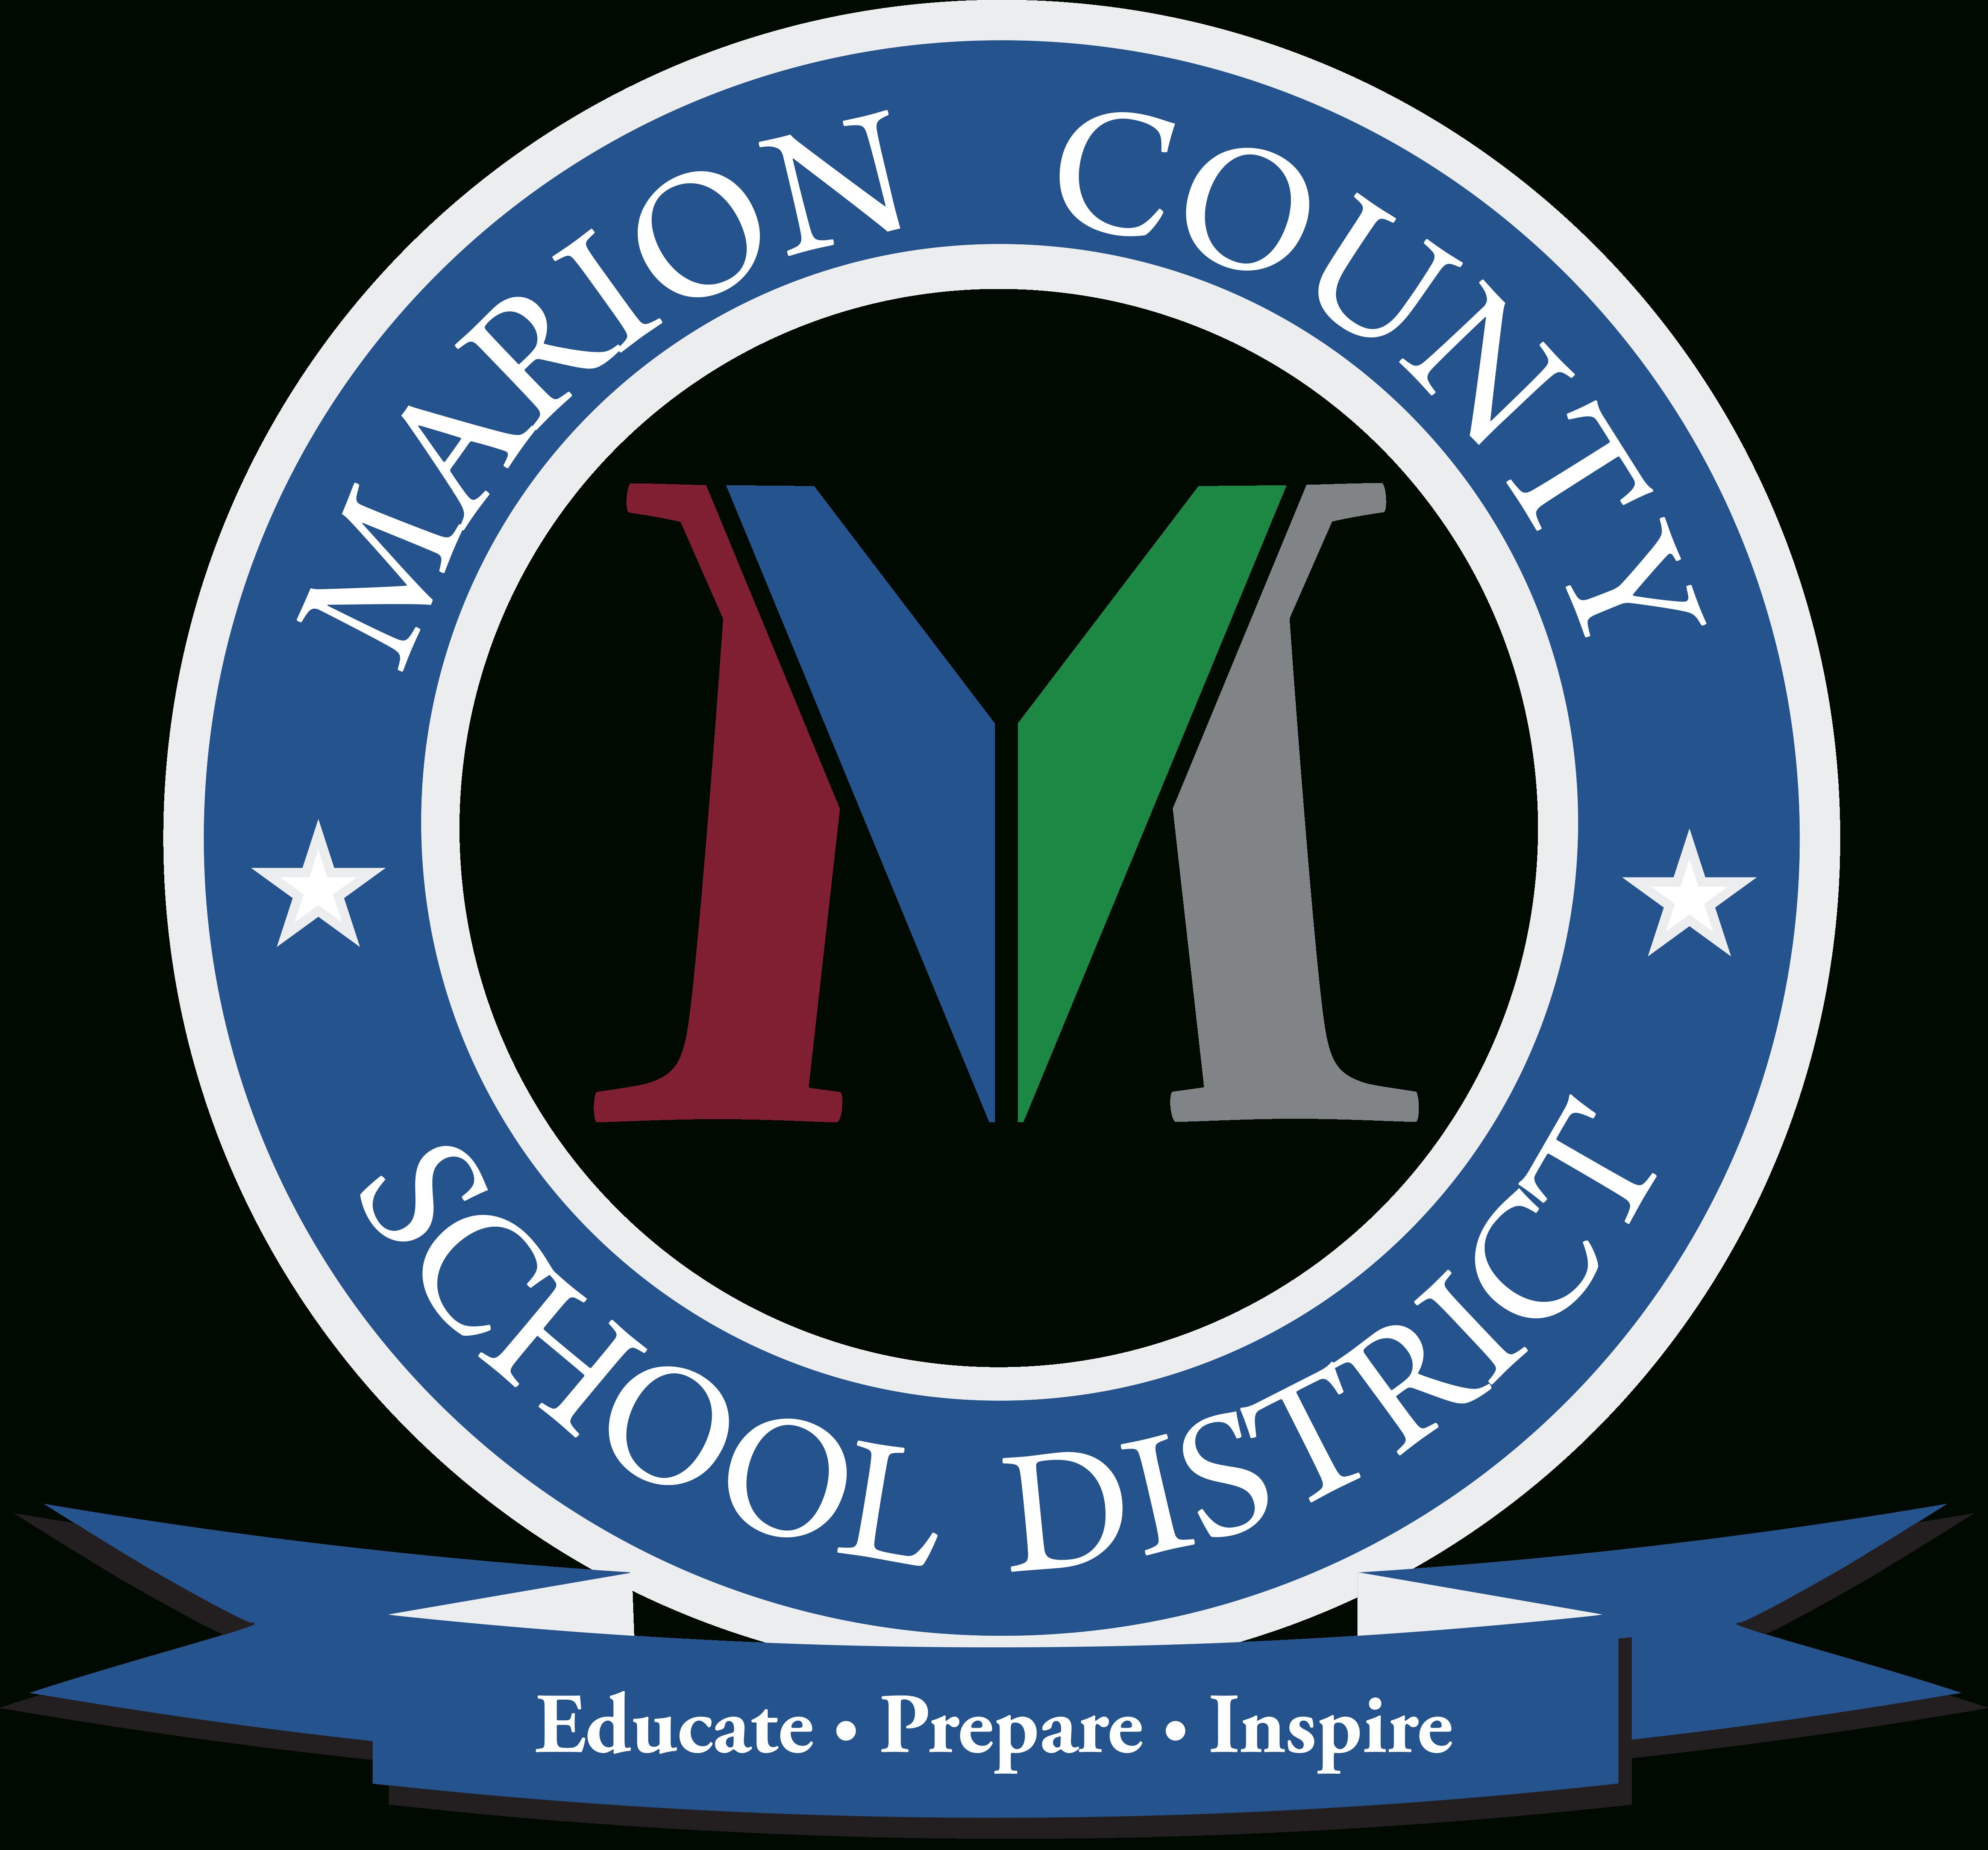 Marion County School District / Calendar Pertaining To School Calendar 2021 2020 Marion County Fl